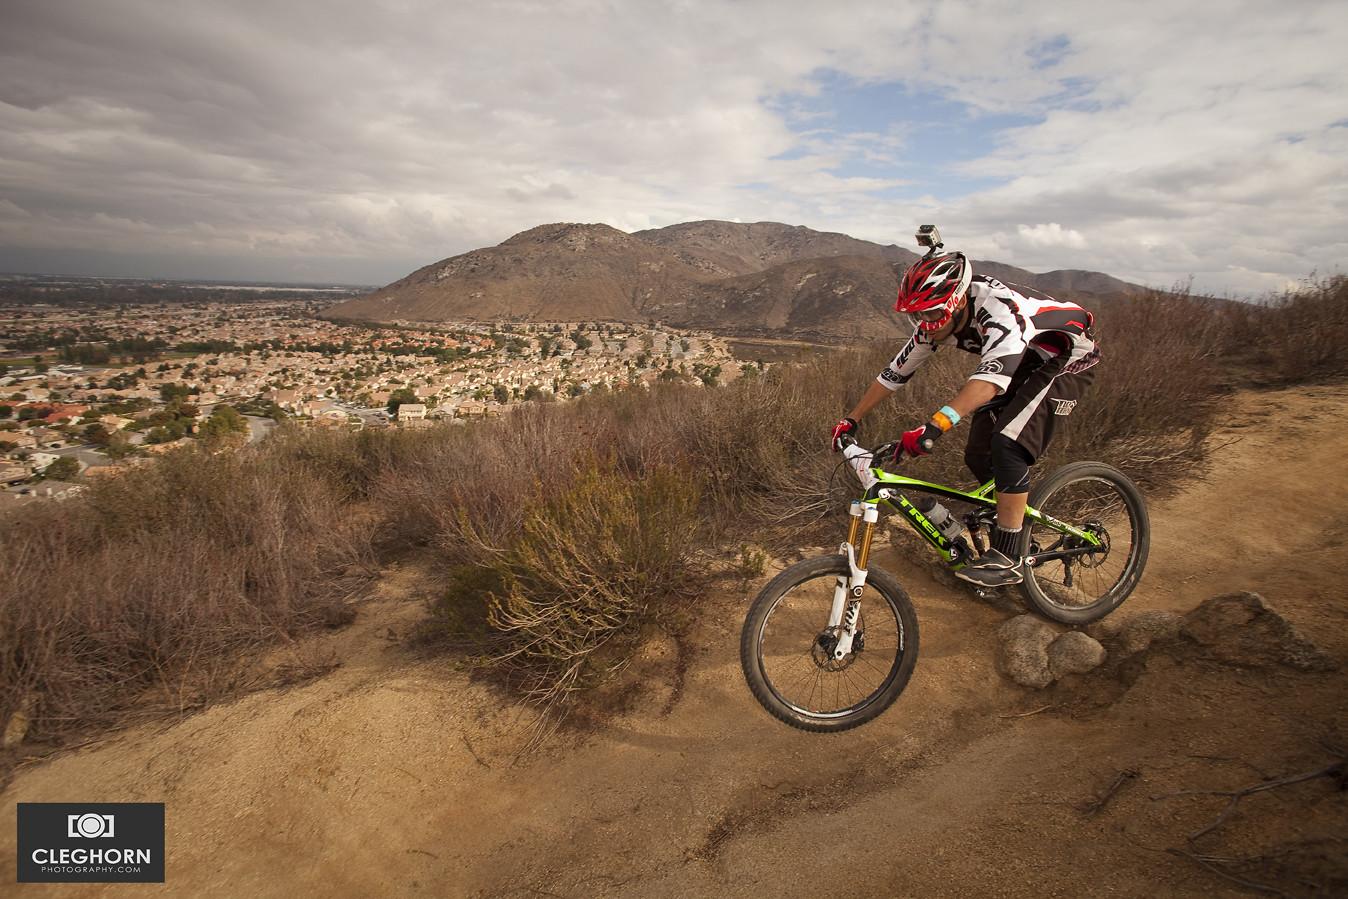 Jon Buckell - Cleghorn Photography - Mountain Biking Pictures - Vital MTB